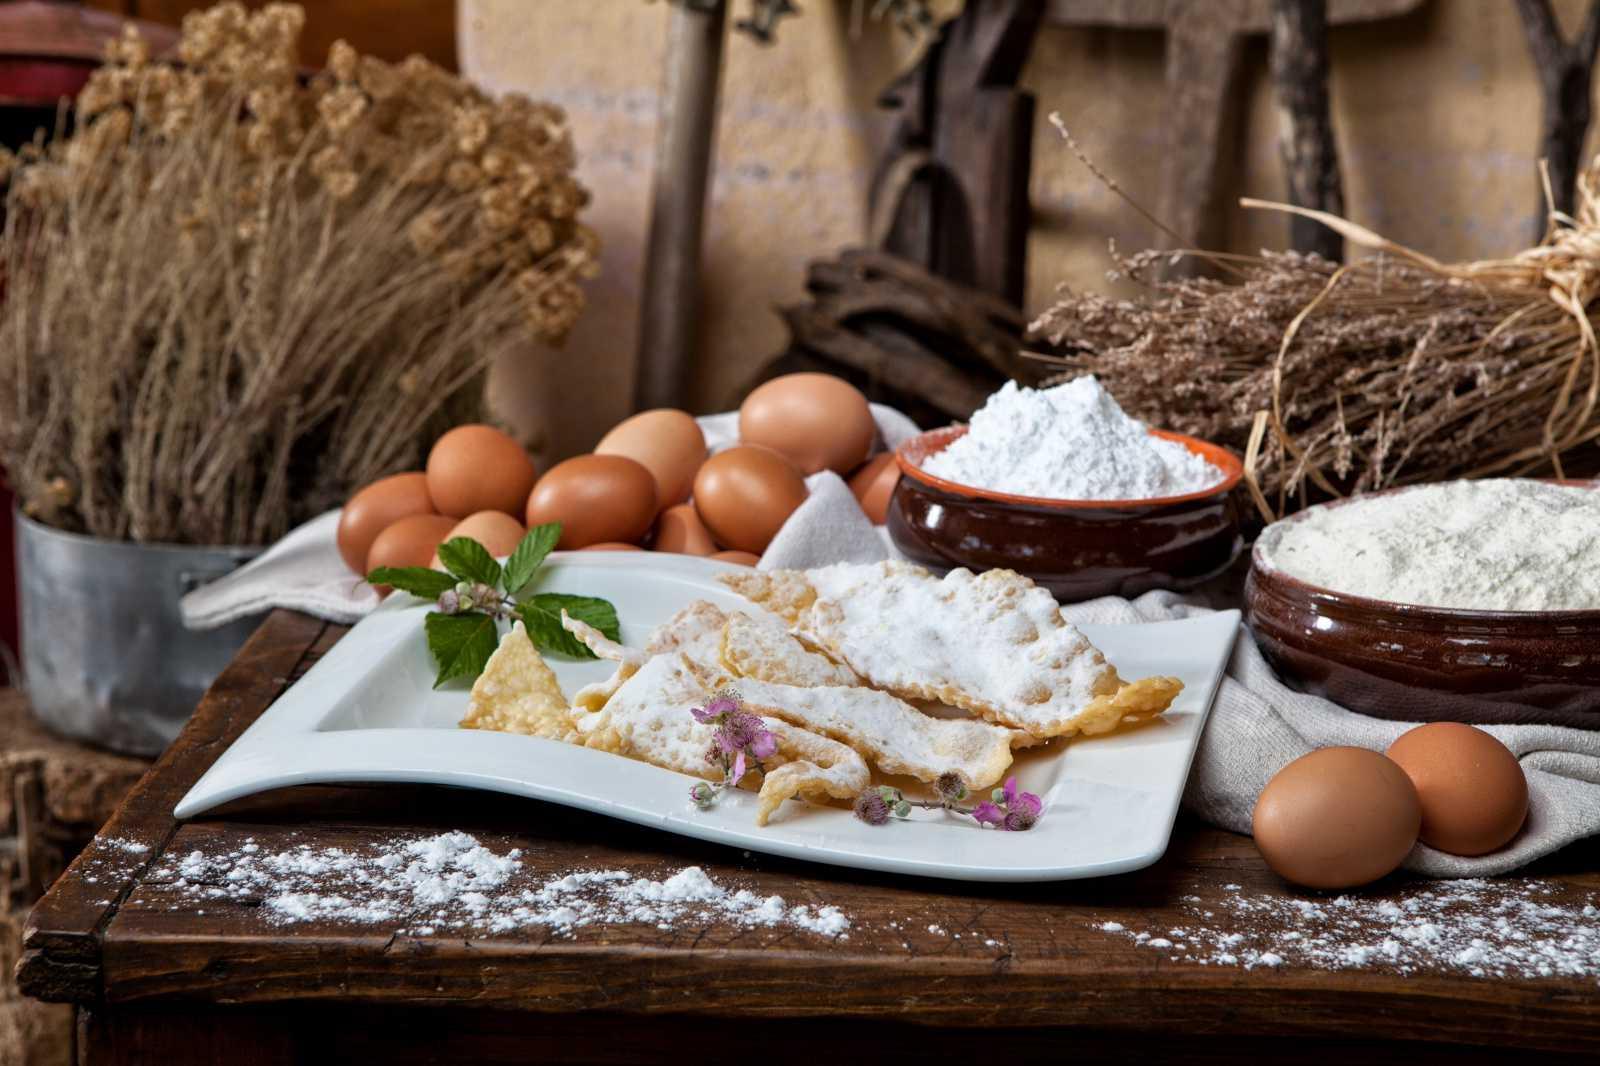 Pasta 04 RITAGLI FRITTI AL LUGHENTE DI BERCHIDDA